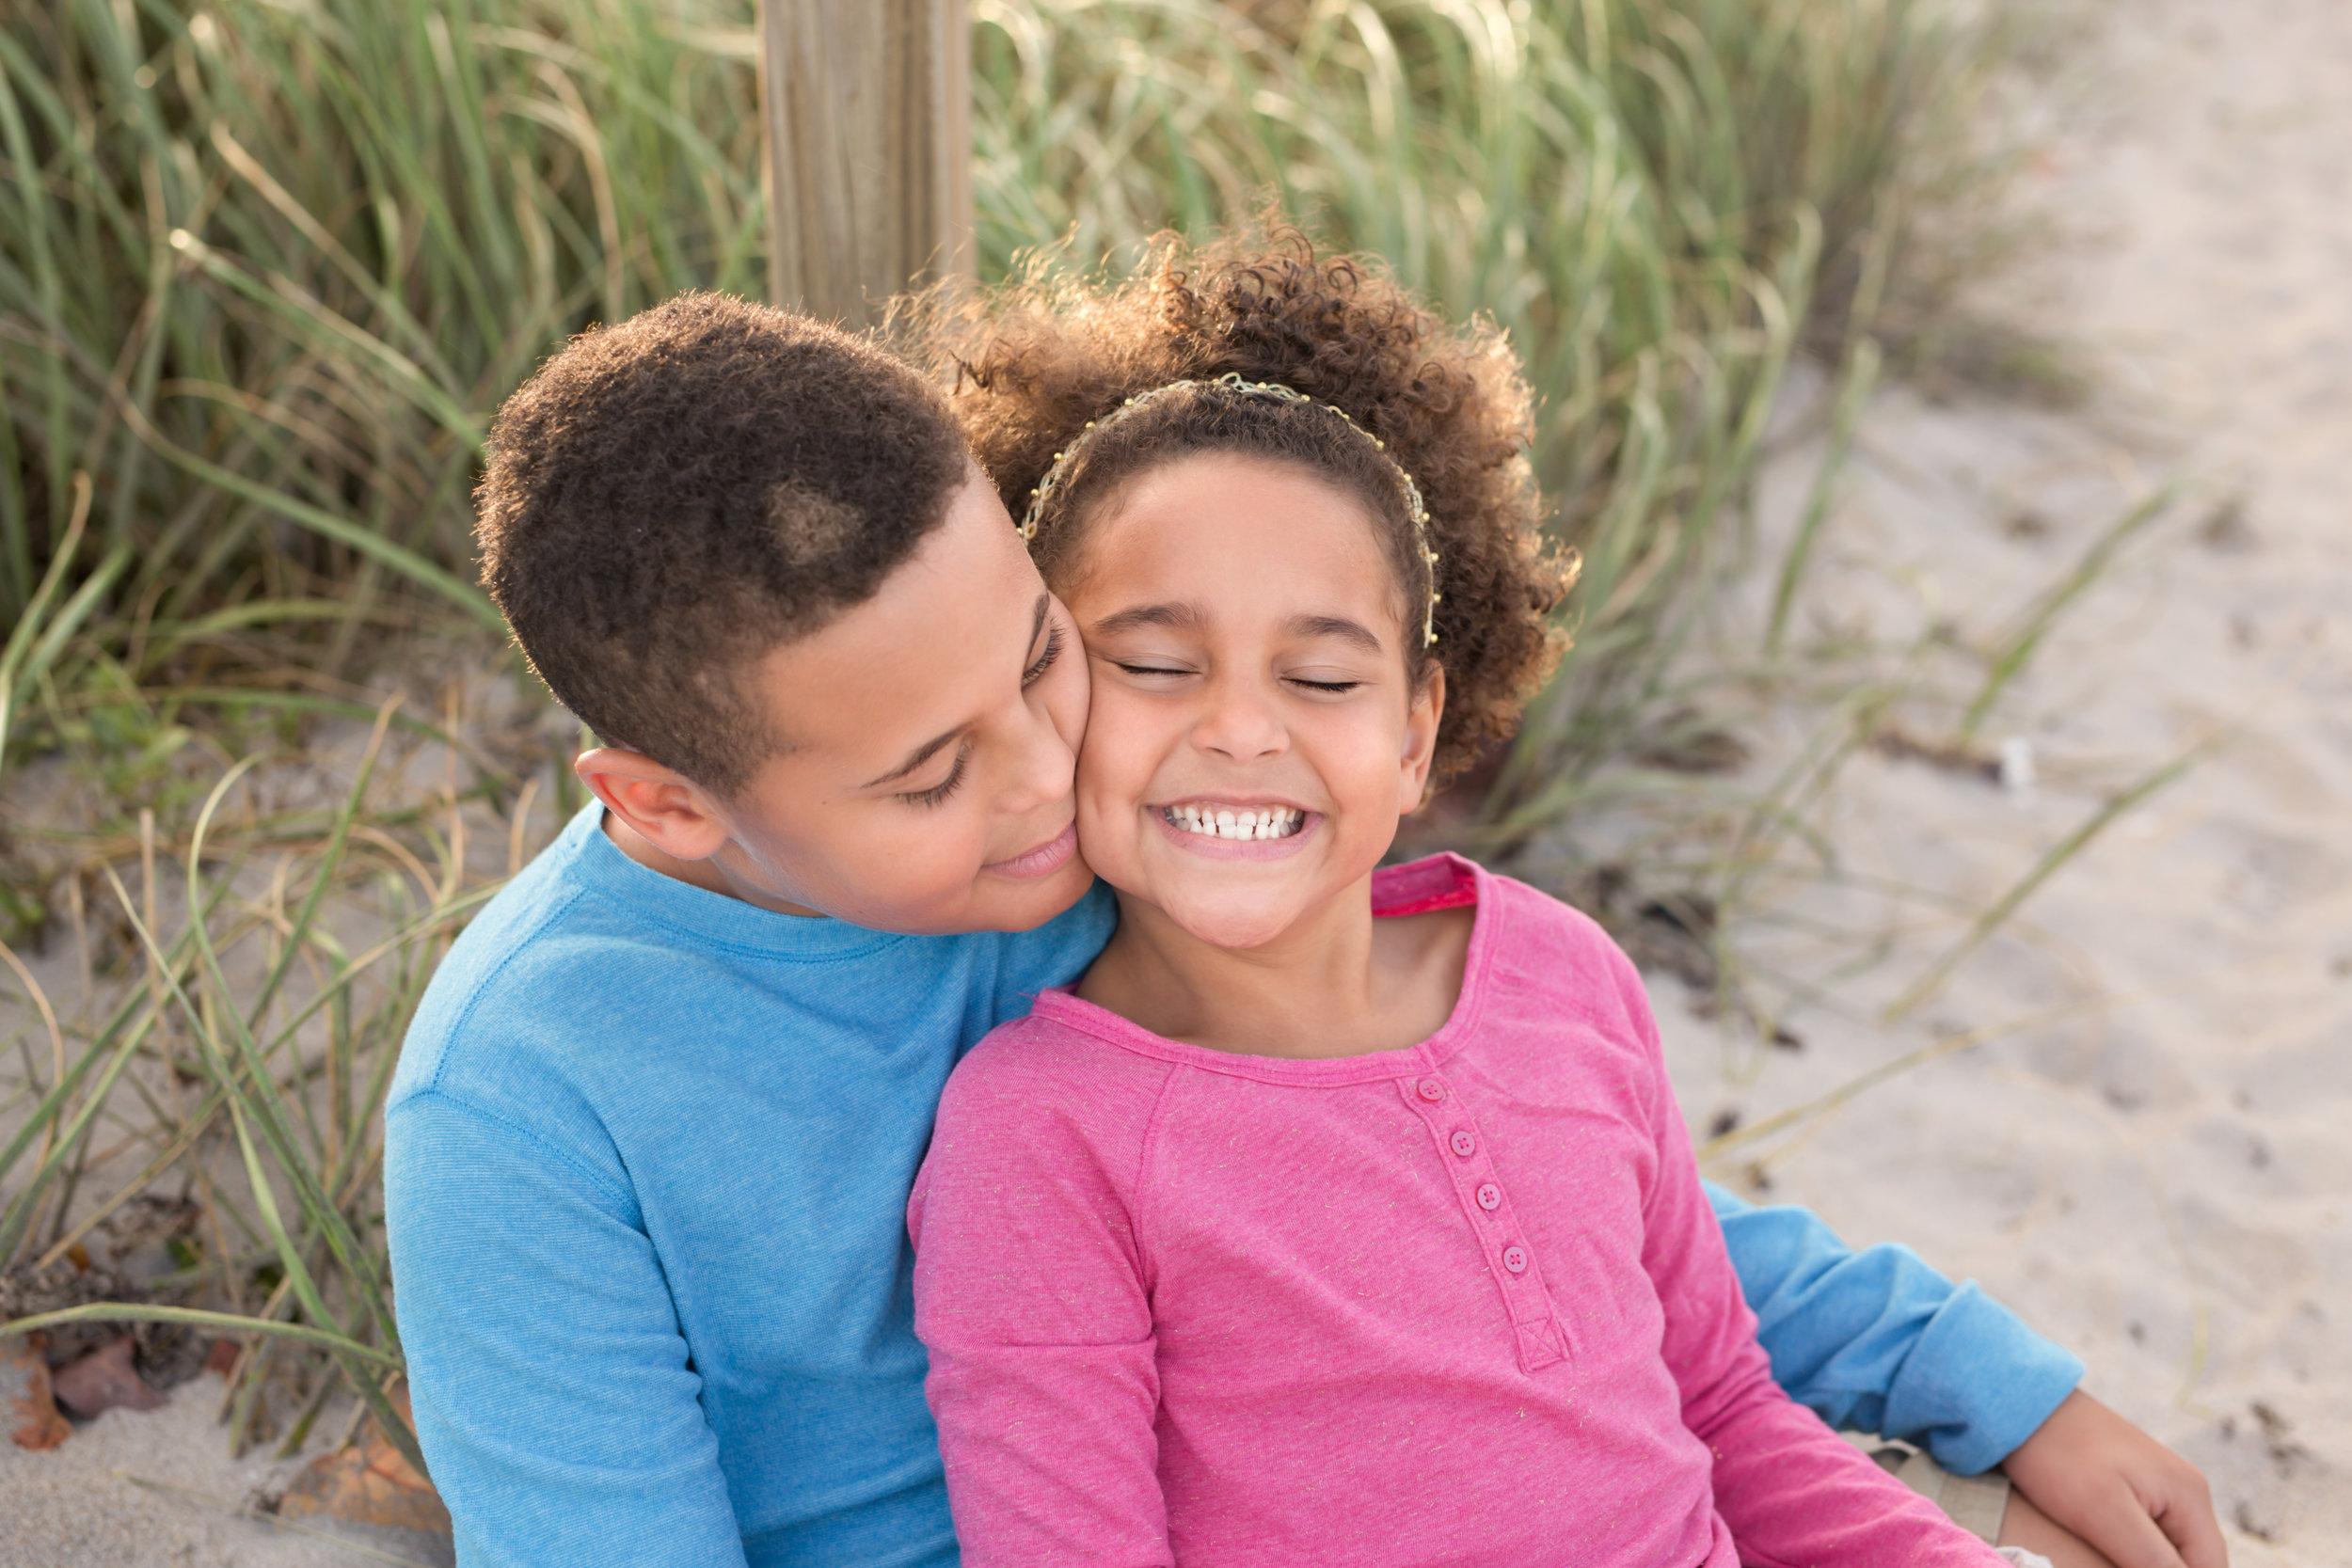 boca-raton-child-photographer-parkland-family-photographer-coral-springs-wellington-lake-worth-boynton-lantana-alissa-delucca-photography-sibling-brother-and-sister.jpg